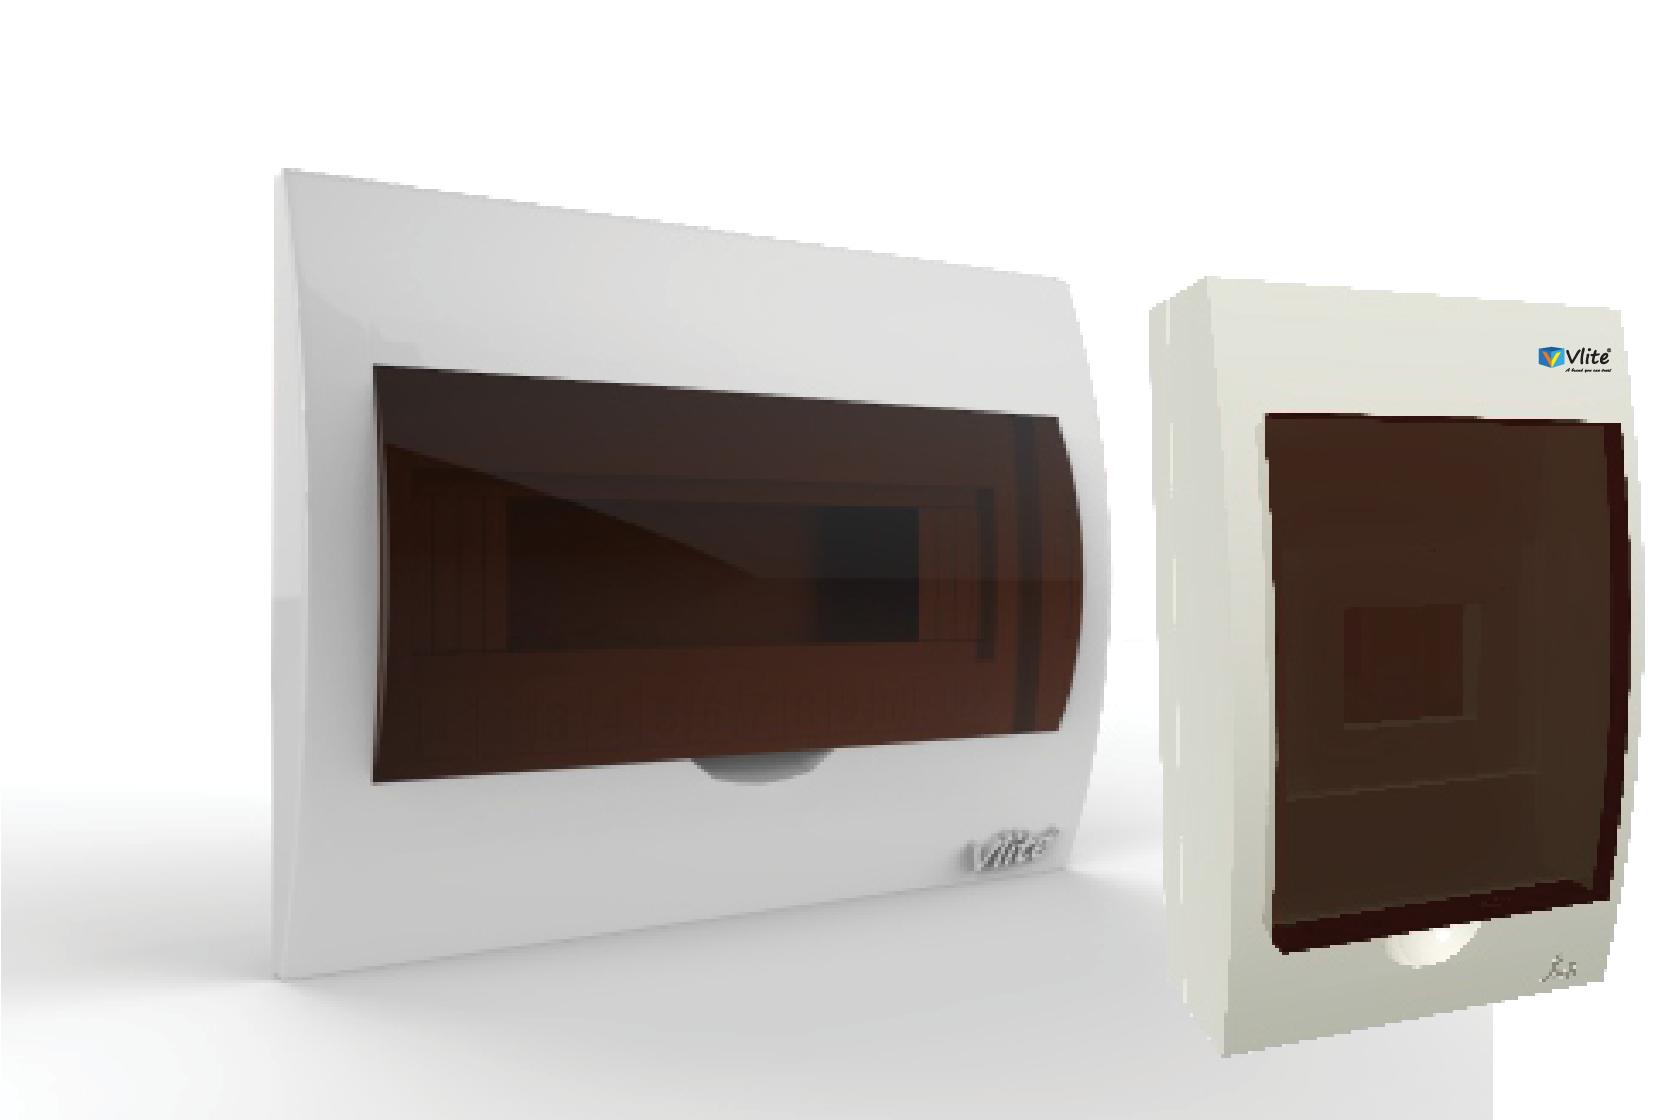 PVC Distribution Box Conceal